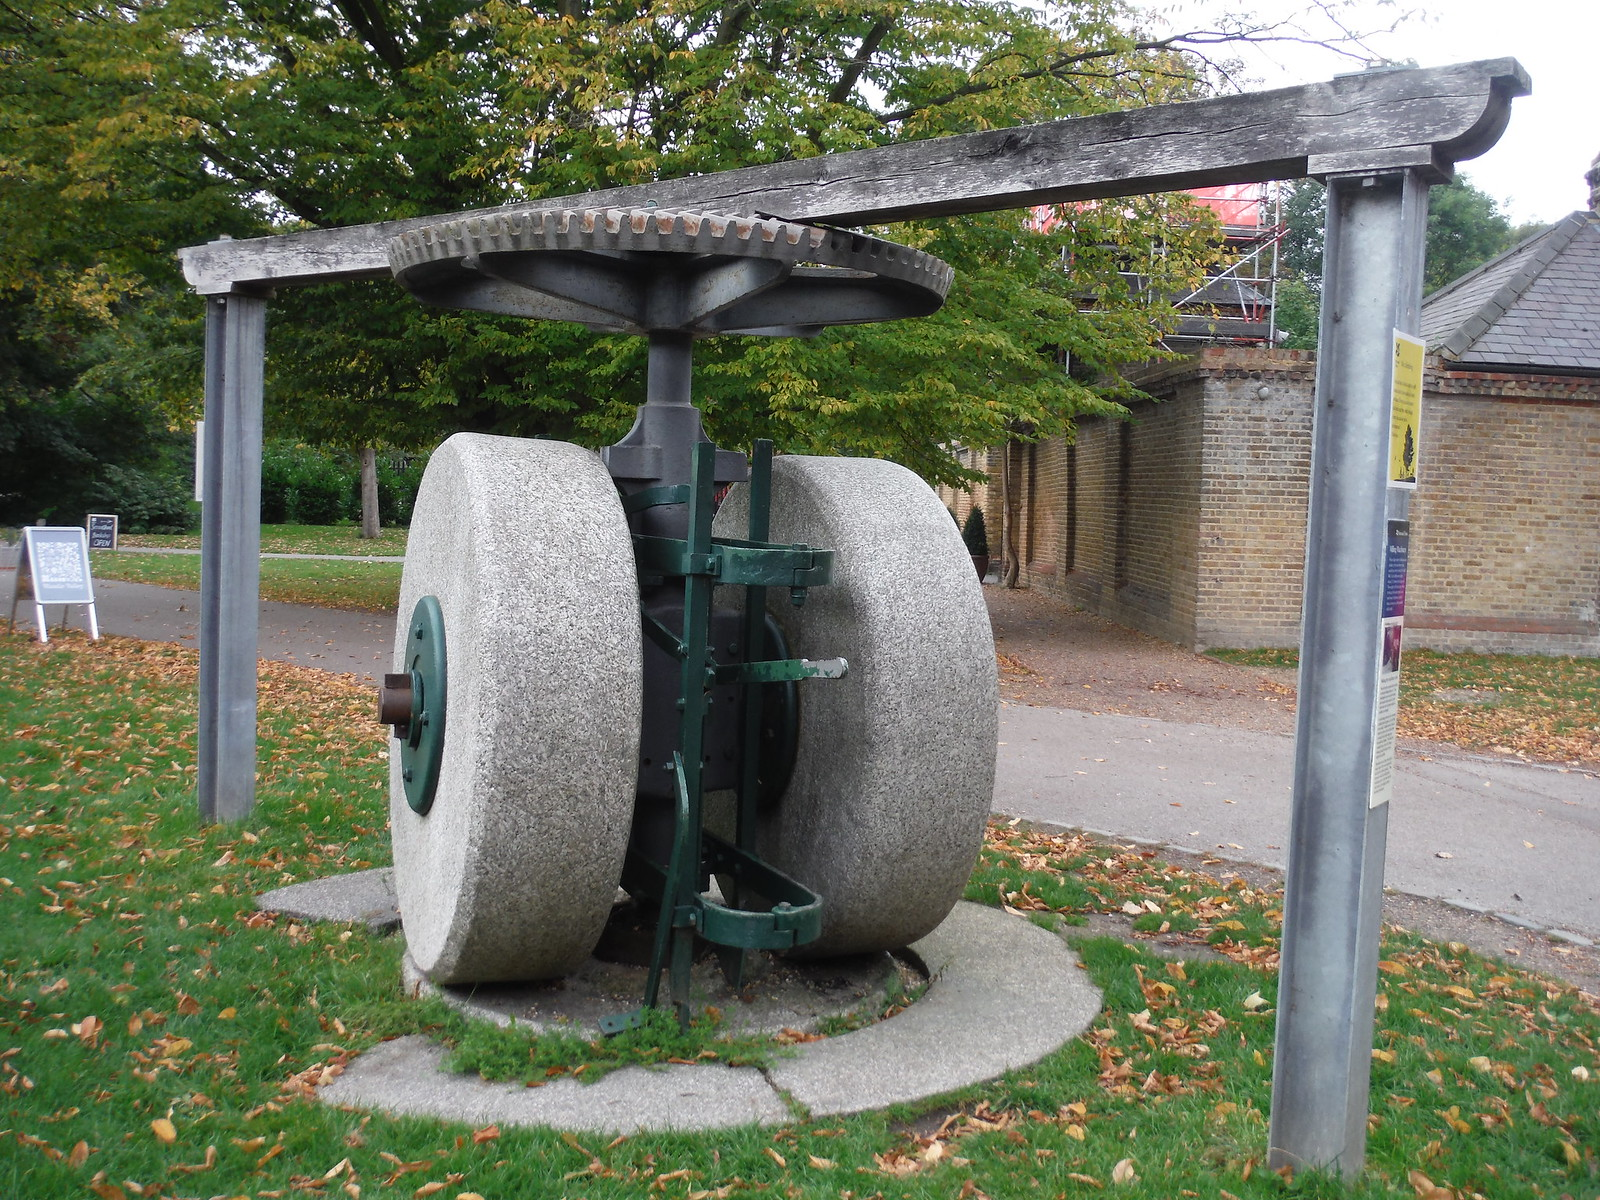 Old Millstones, Morden Hall Park SWC Walk Short 13 - Morden Hall Park and Merton Abbey Mills